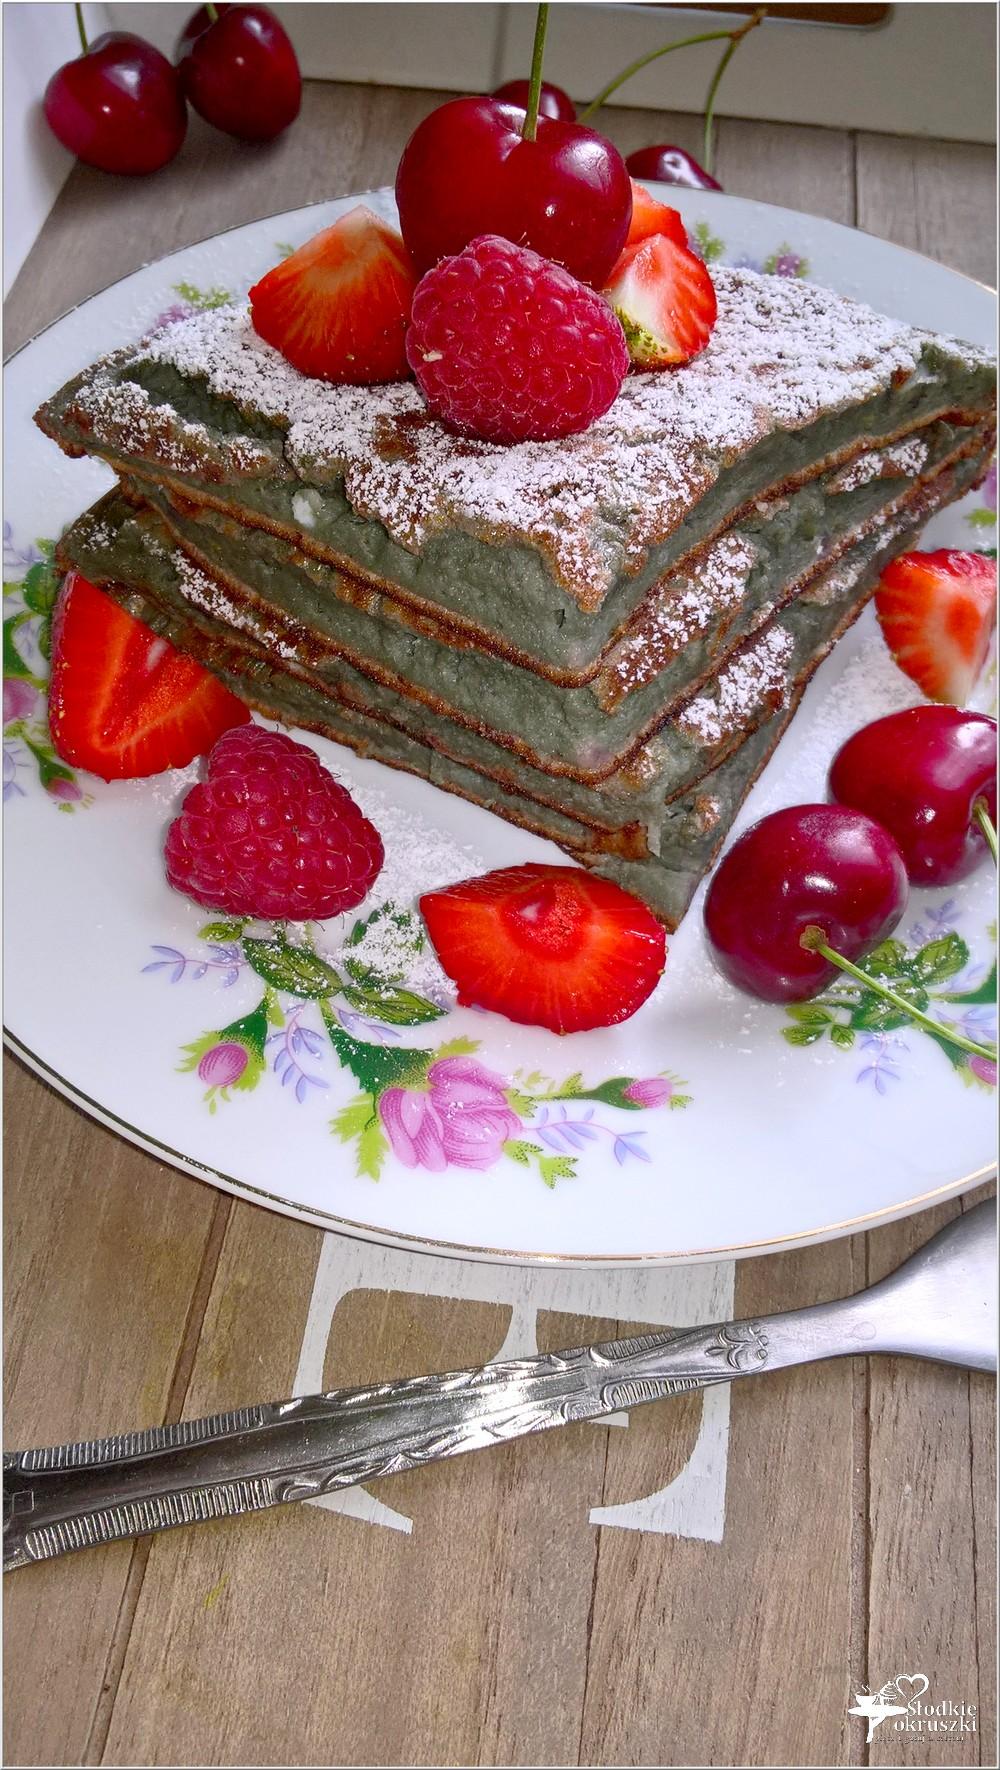 Jagodowy omlet śniadaniowy (z owocami lata) (3)